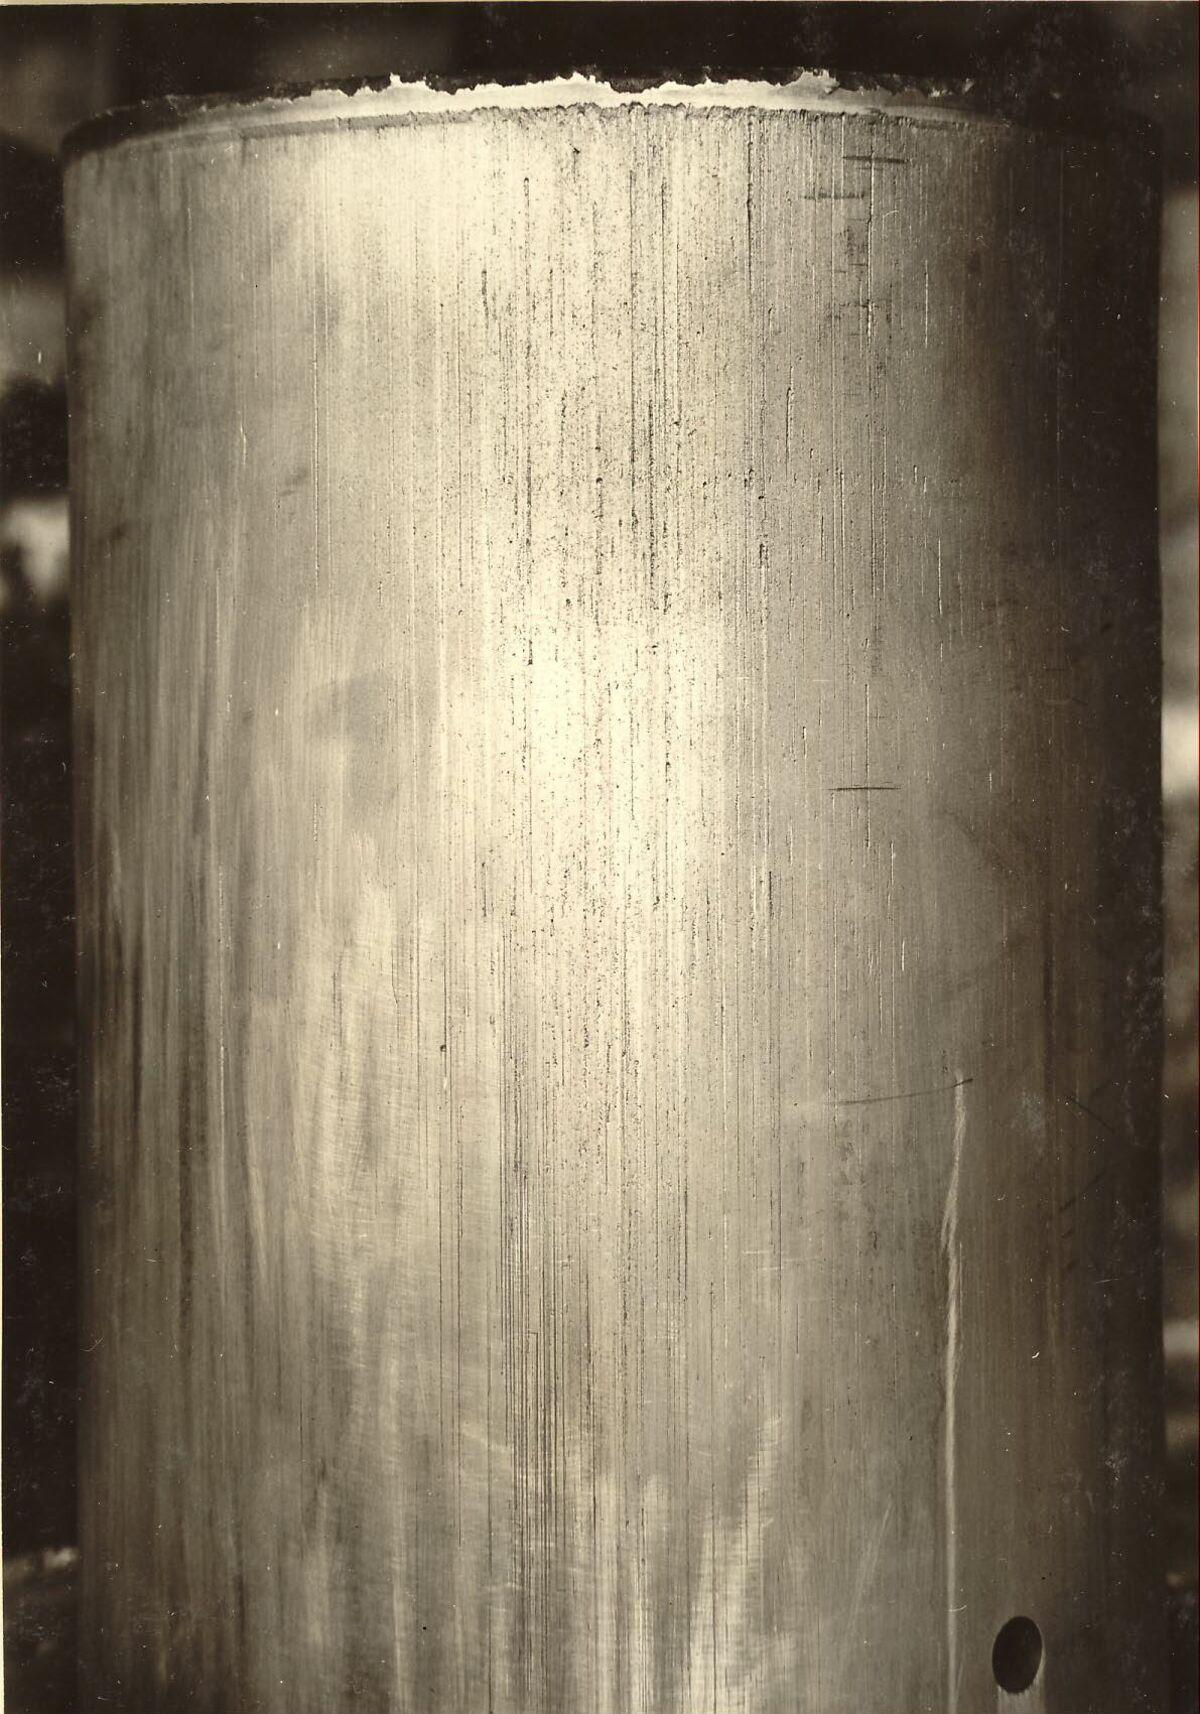 GFA 24/53.1178: Nicholls moulding machine